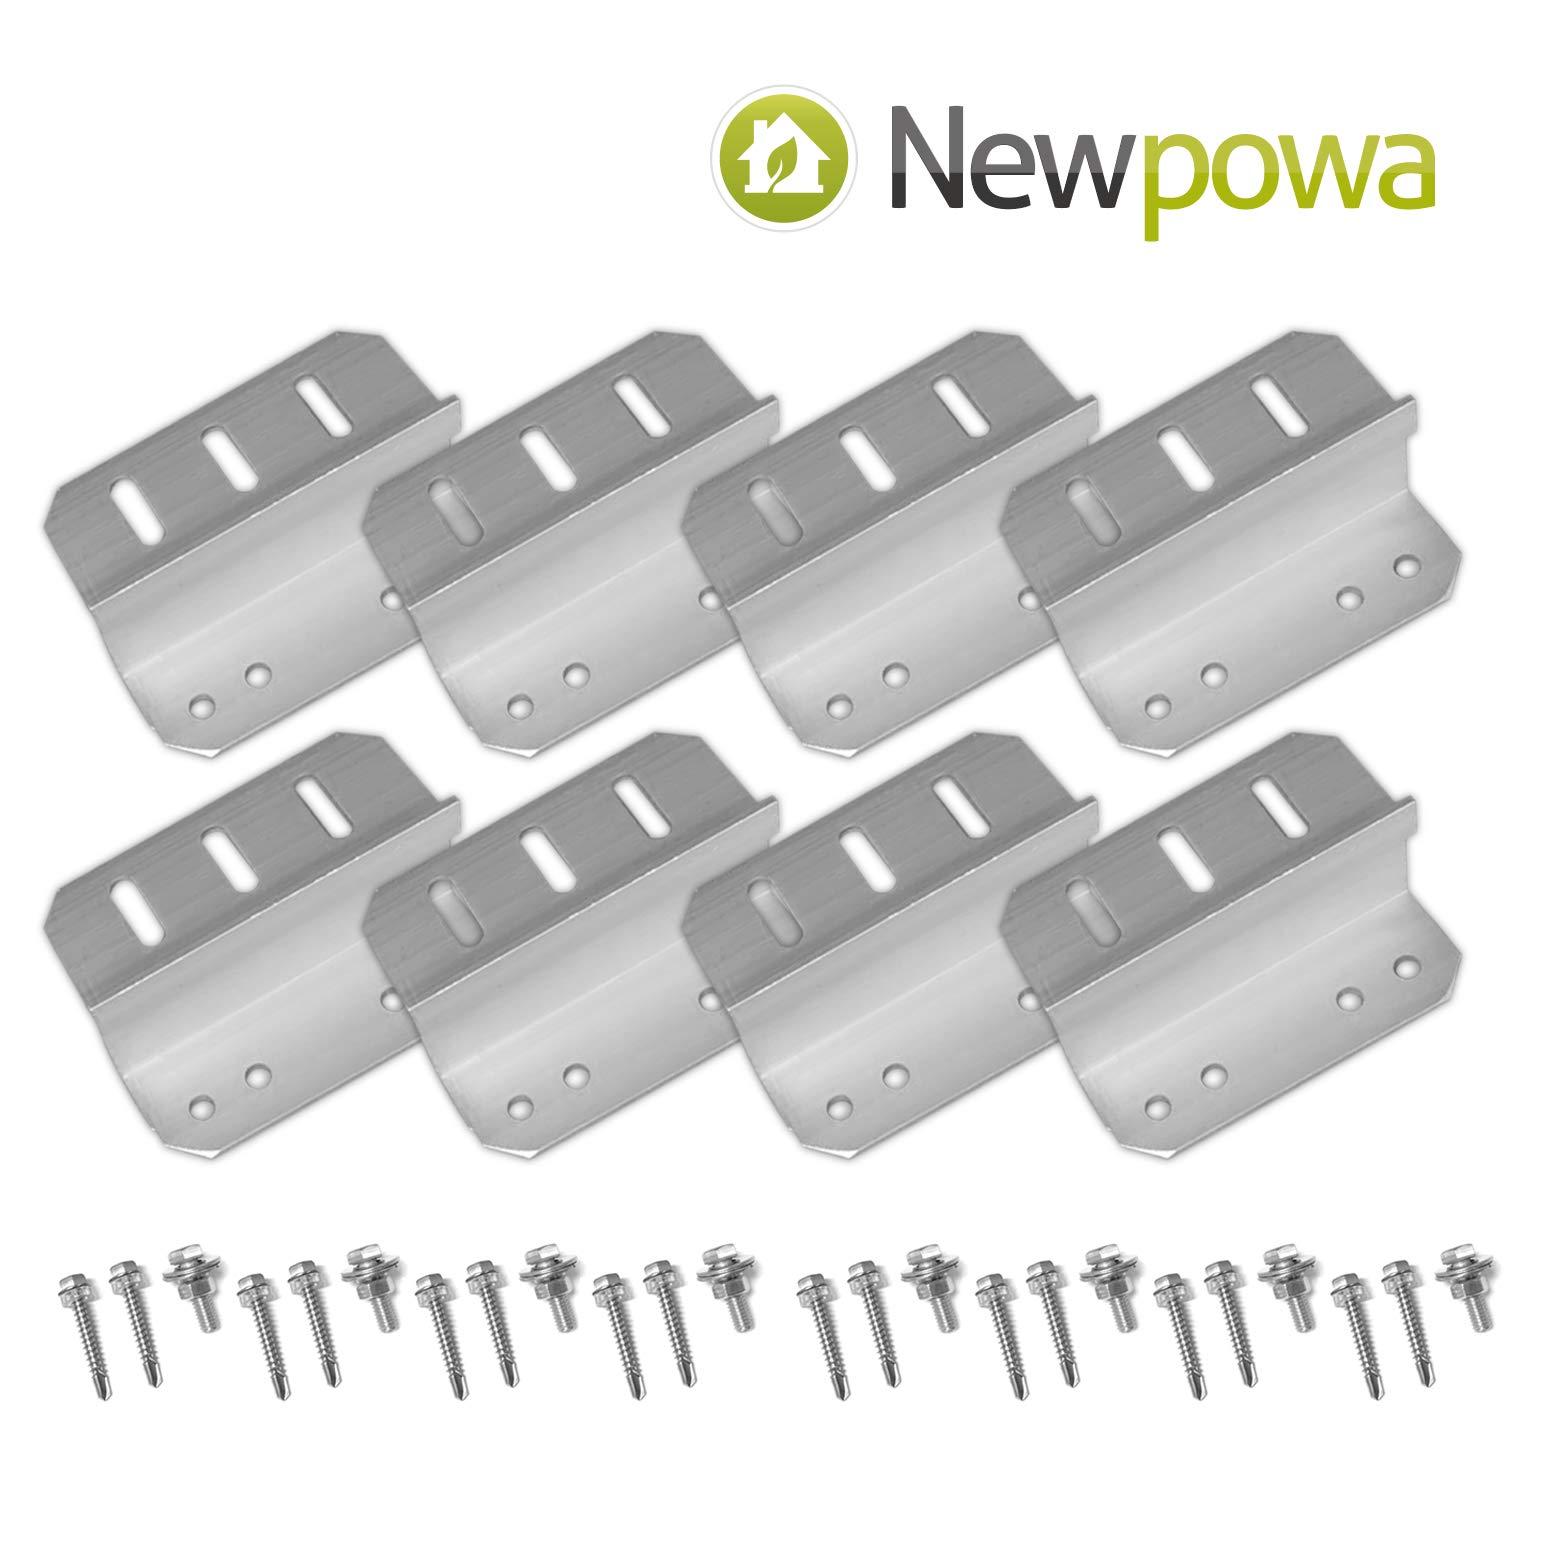 Newpowa 2sets Solar Panel Mounting Bracket Universal Flat Mounts Z Roof Wall by Newpowa